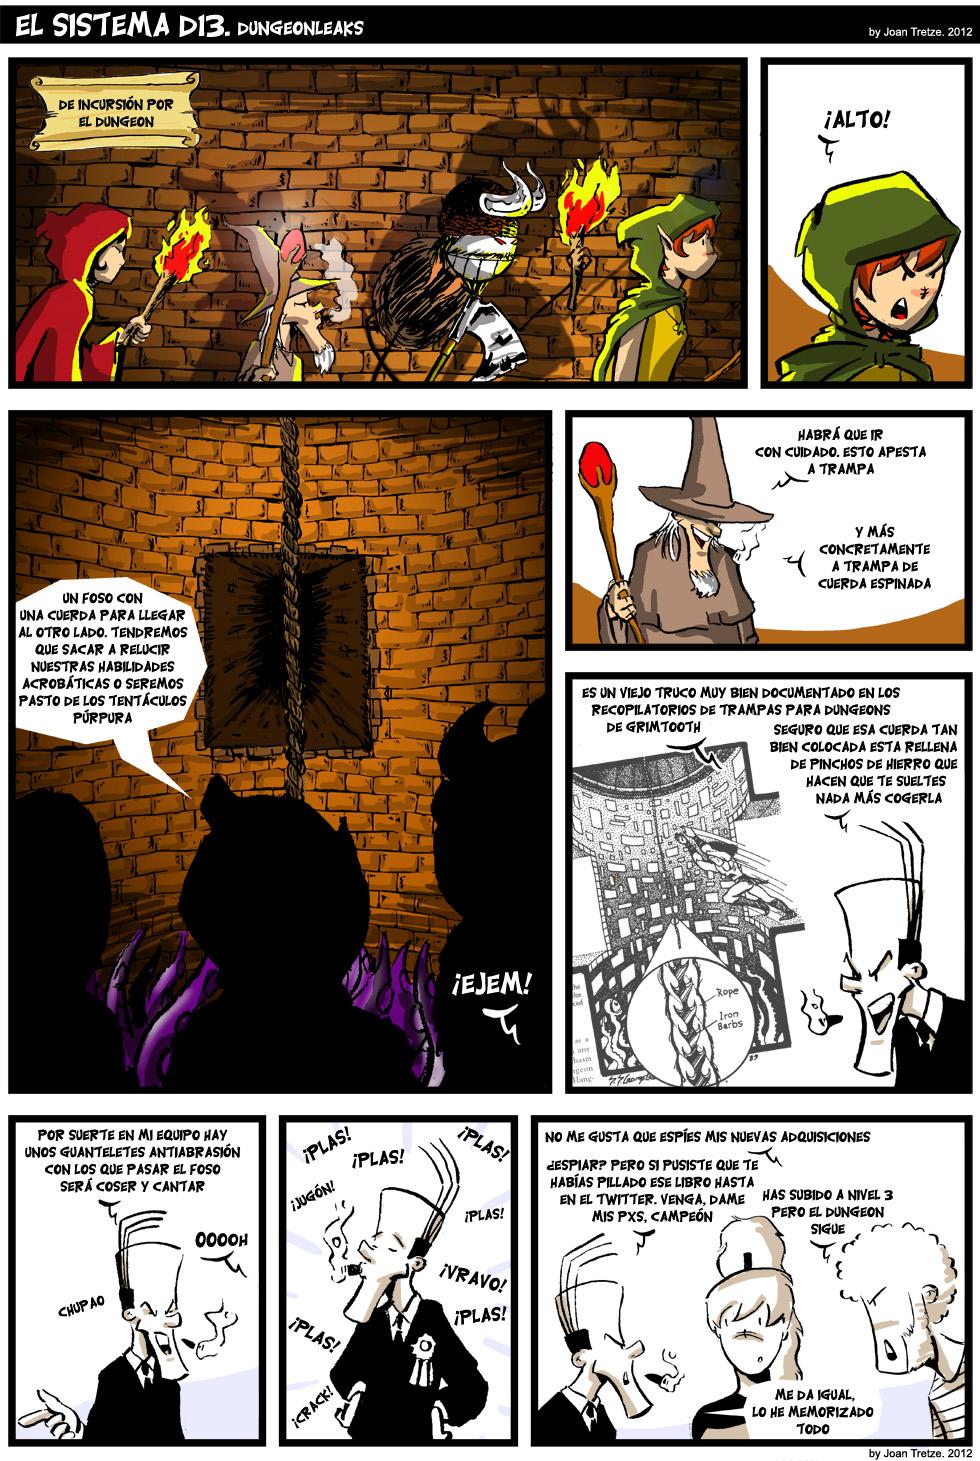 389. Dungeonleaks